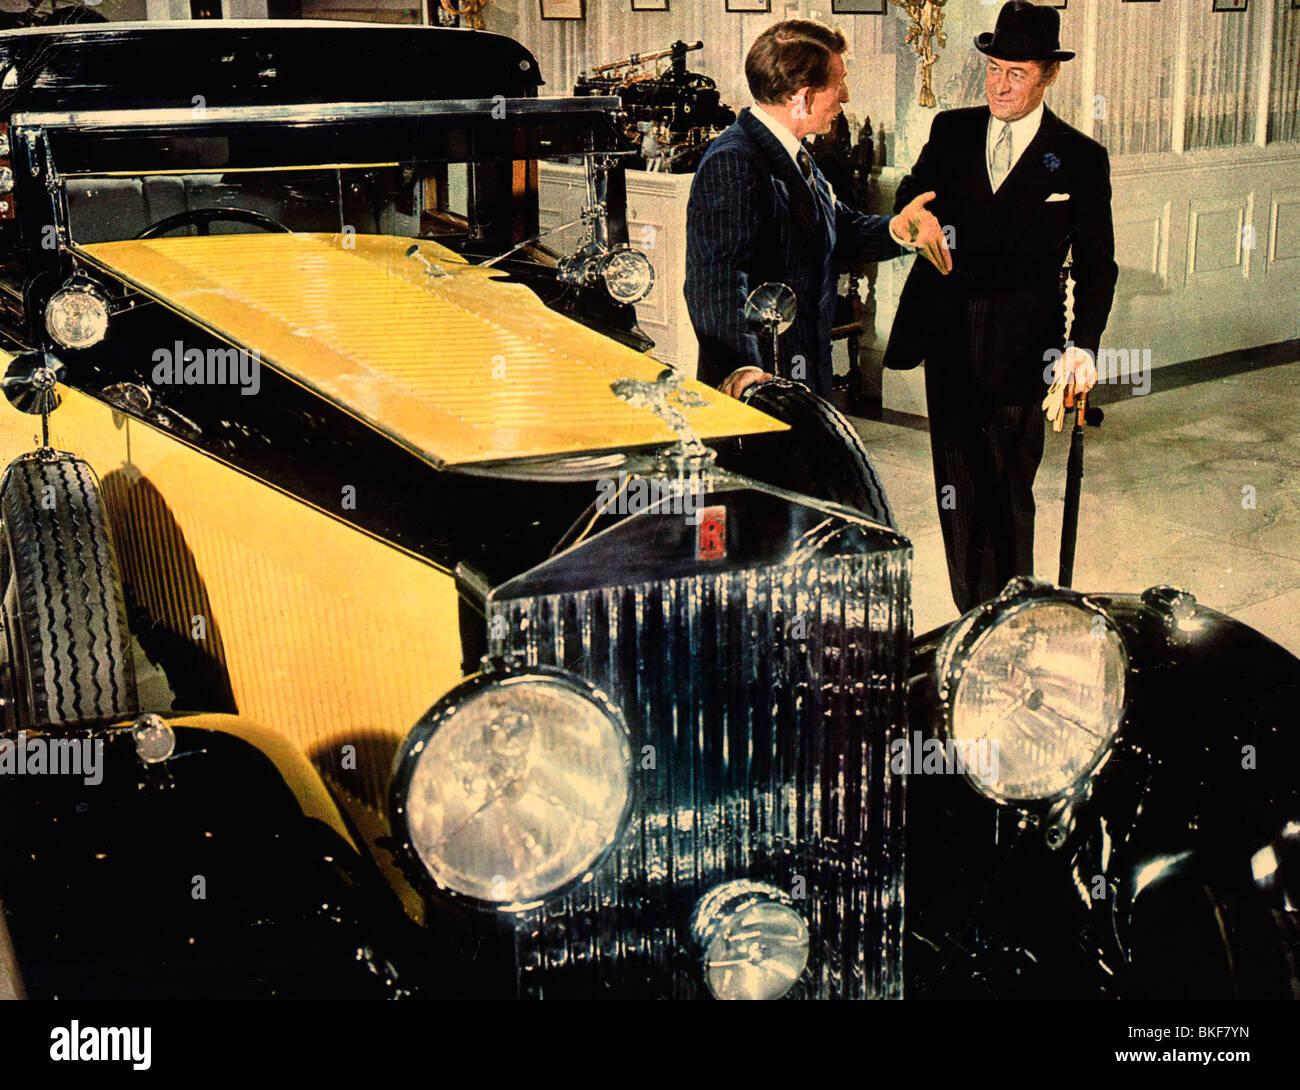 The Yellow Rolls Royce Stock Photos & The Yellow Rolls Royce Stock